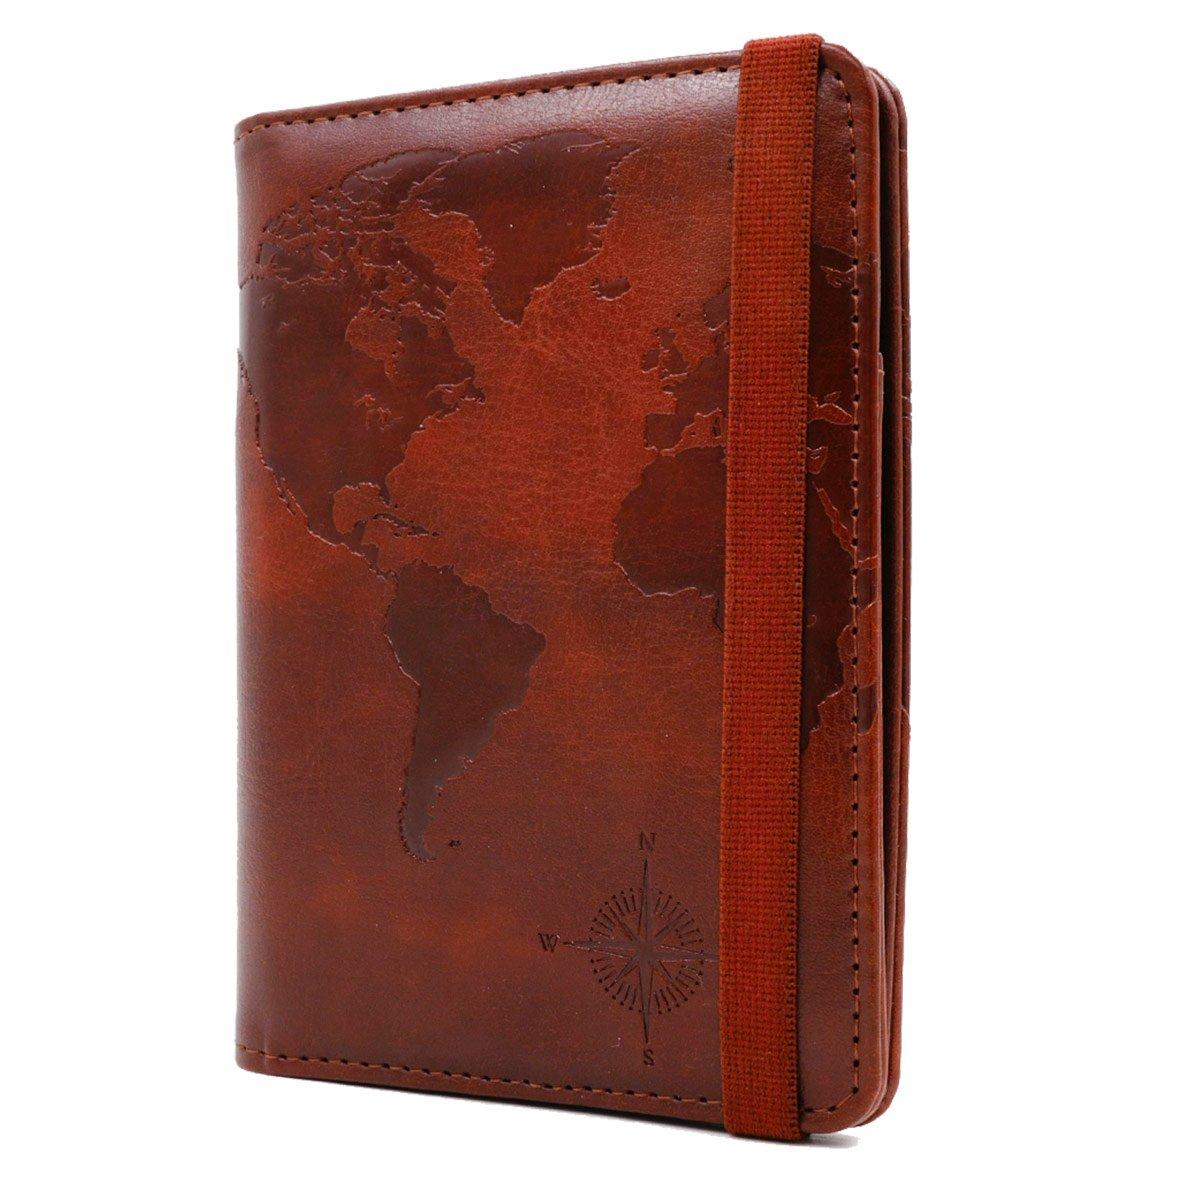 Kandouren RFID Blocking Passport Holder Cover Case,travel luggage passport wallet made with Brown Map Crazy Horse PU Leather for Men & Women by kandouren (Image #4)